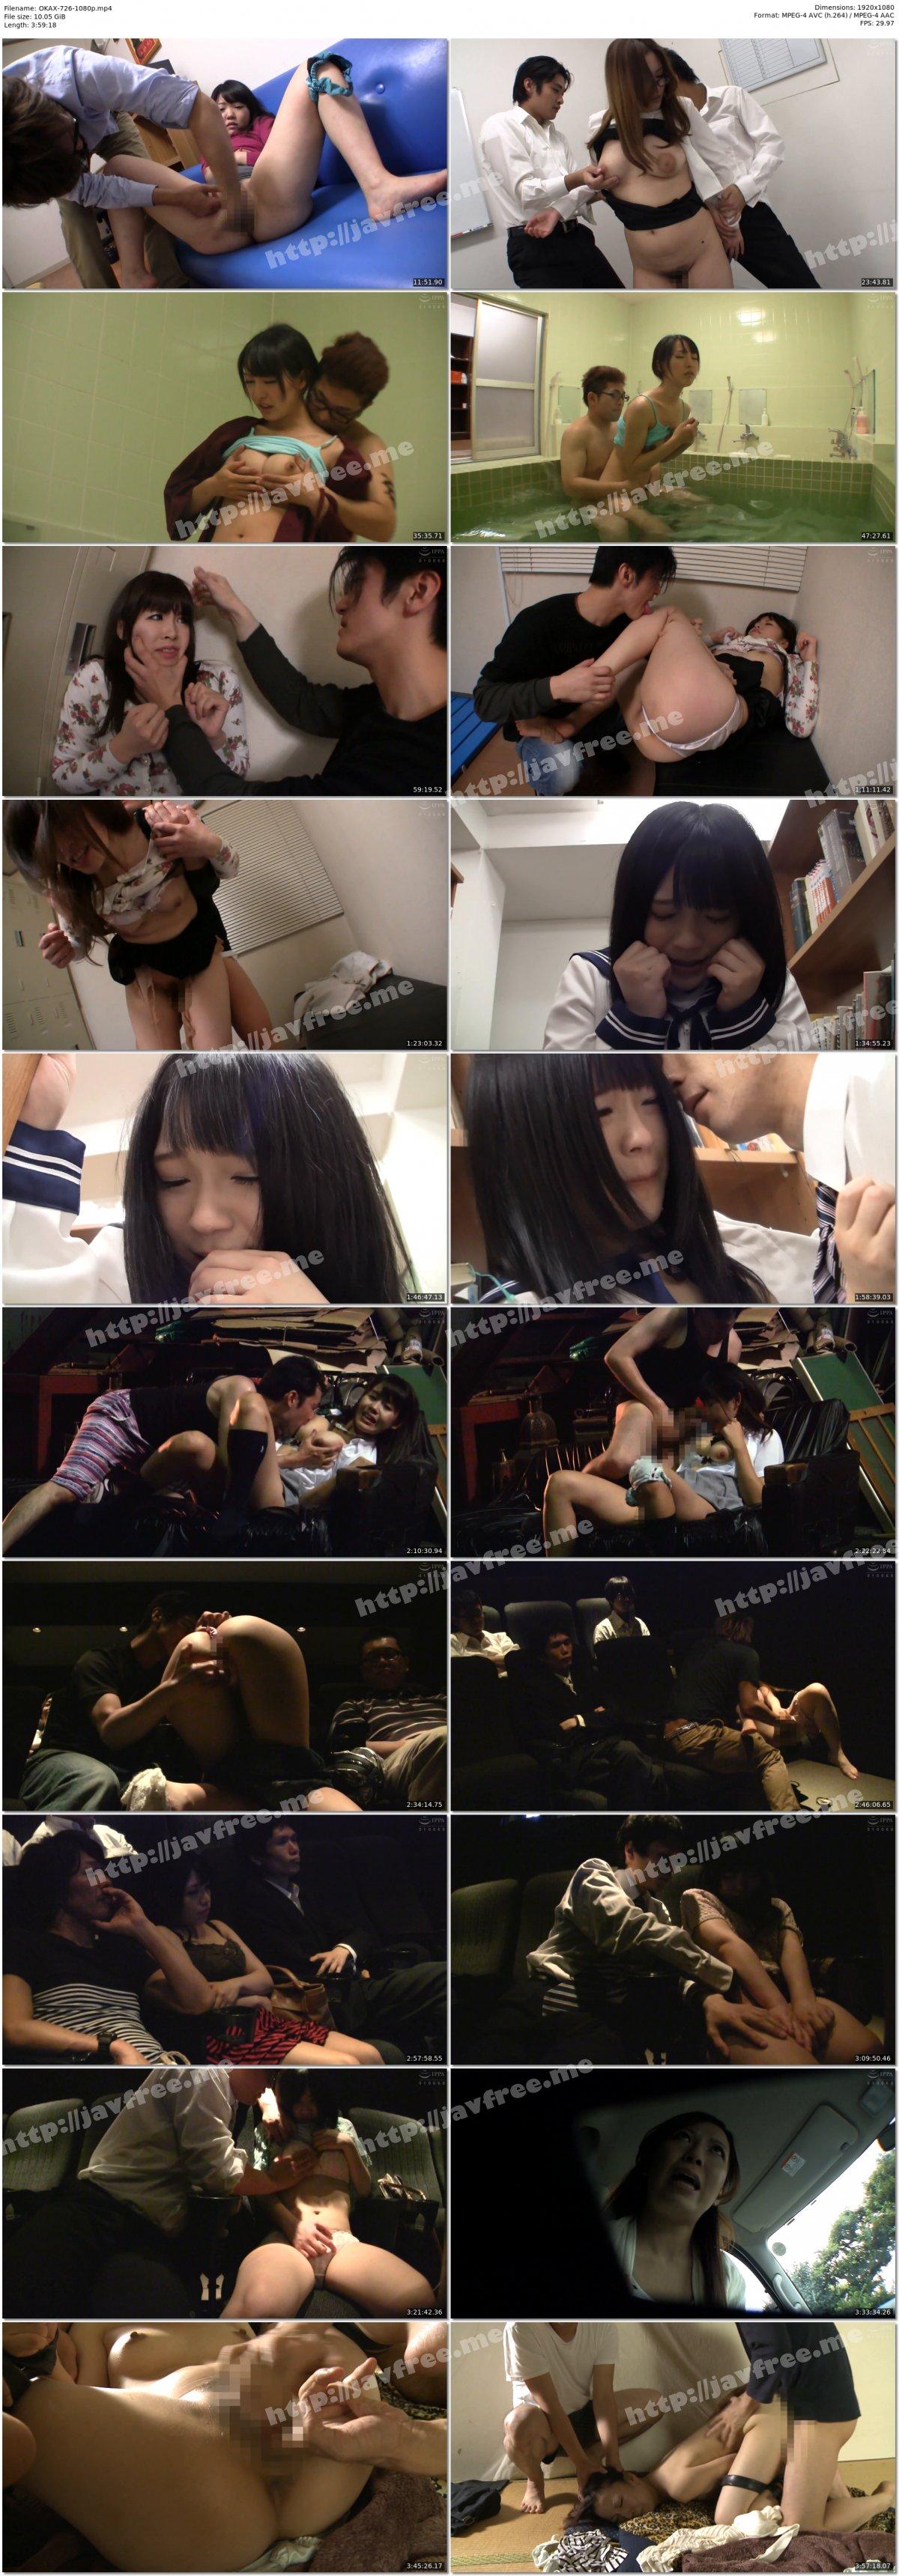 [HD][OKAX-726] 「お願い!本当にやめて…」痴姦に遭い不本意ながらオマ○コを濡らしてしまった素人オンナたち4時間 - image OKAX-726-1080p on https://javfree.me